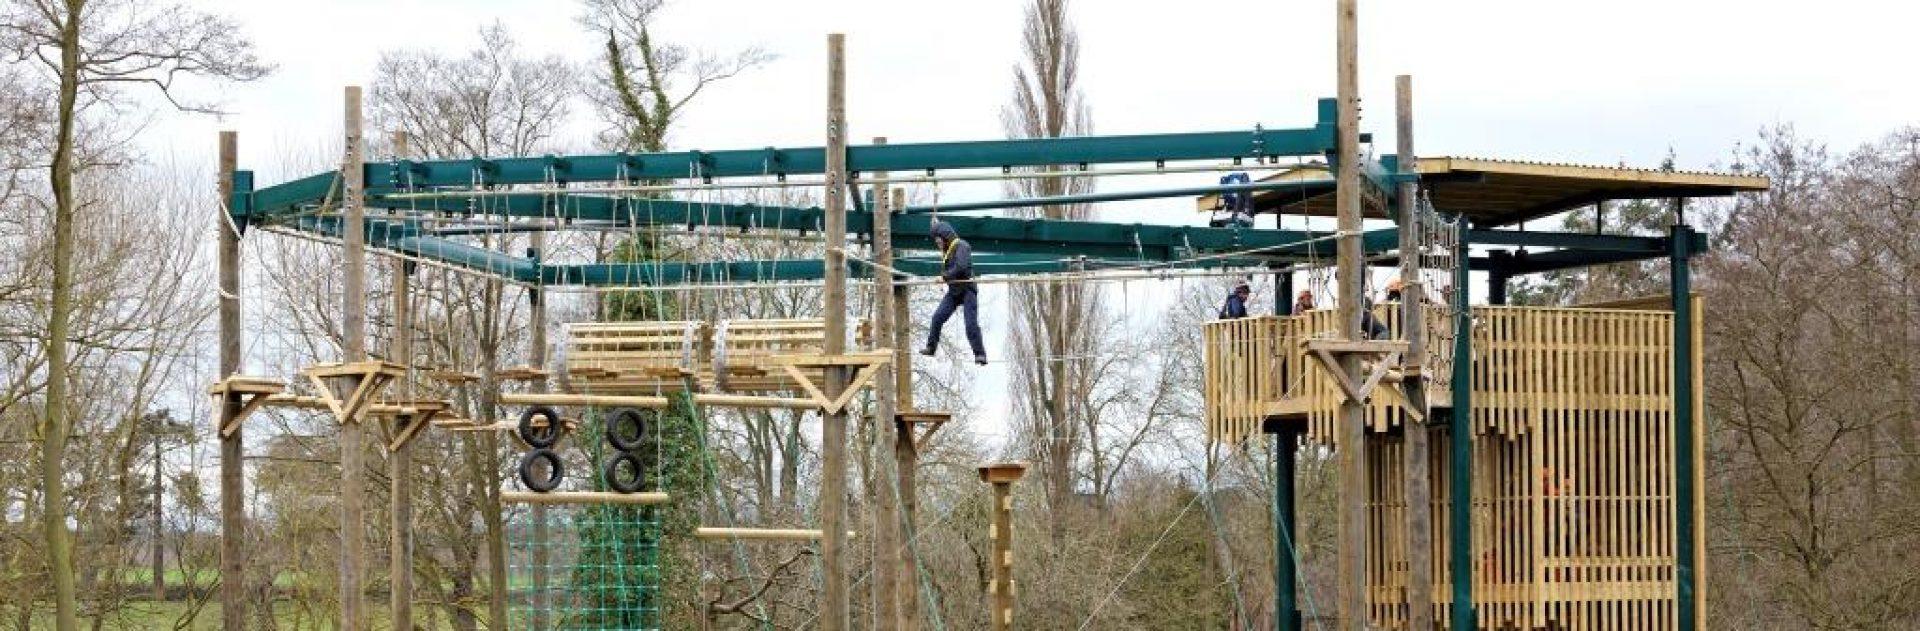 High Aerial Trek Ropes